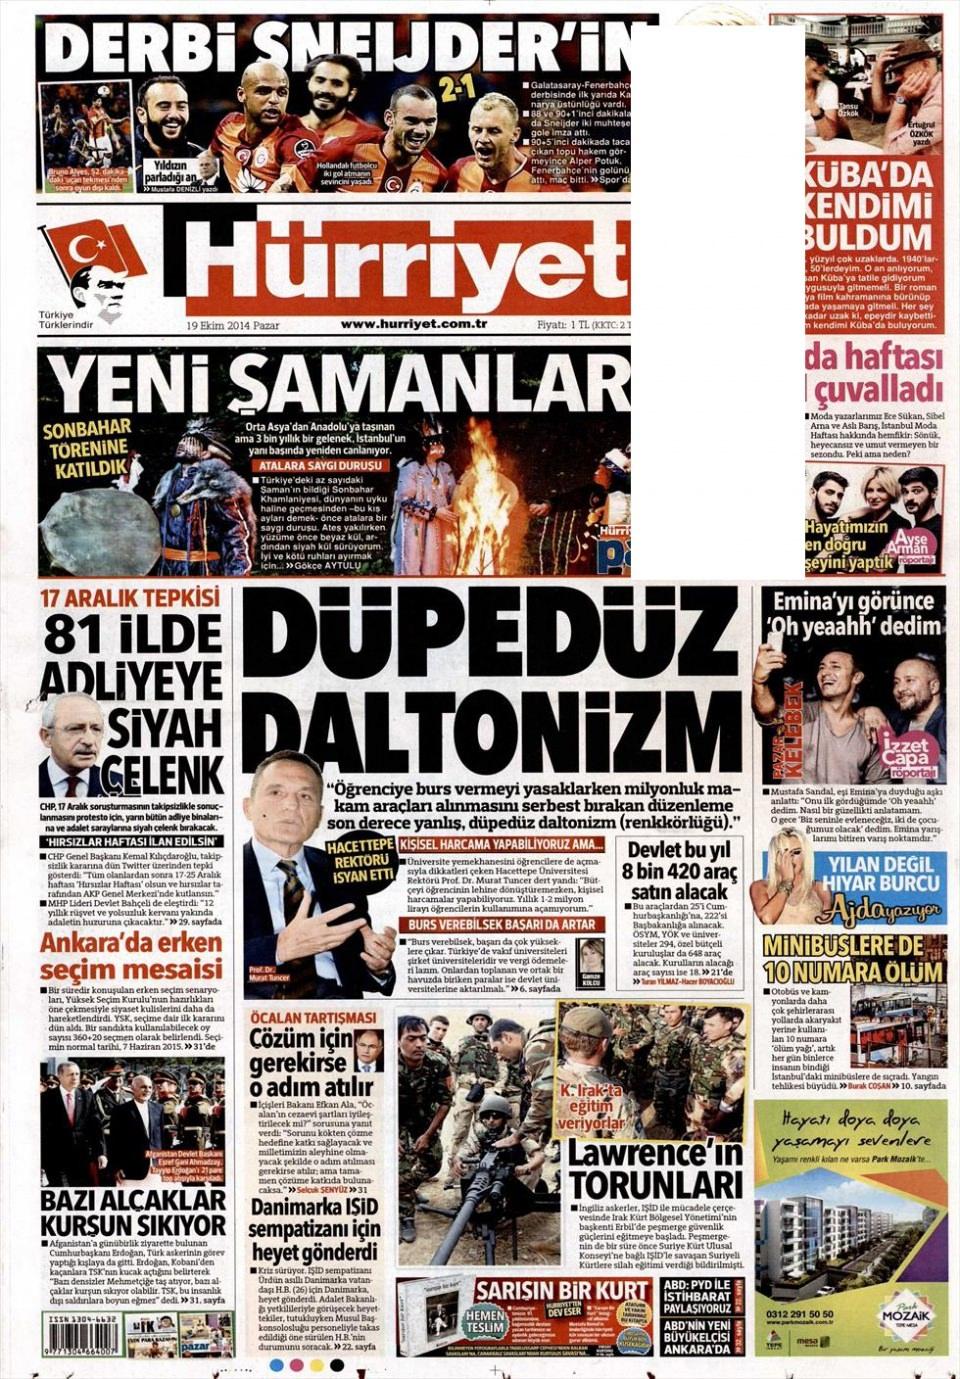 19 Ekim 2014 gazete manşetleri 15